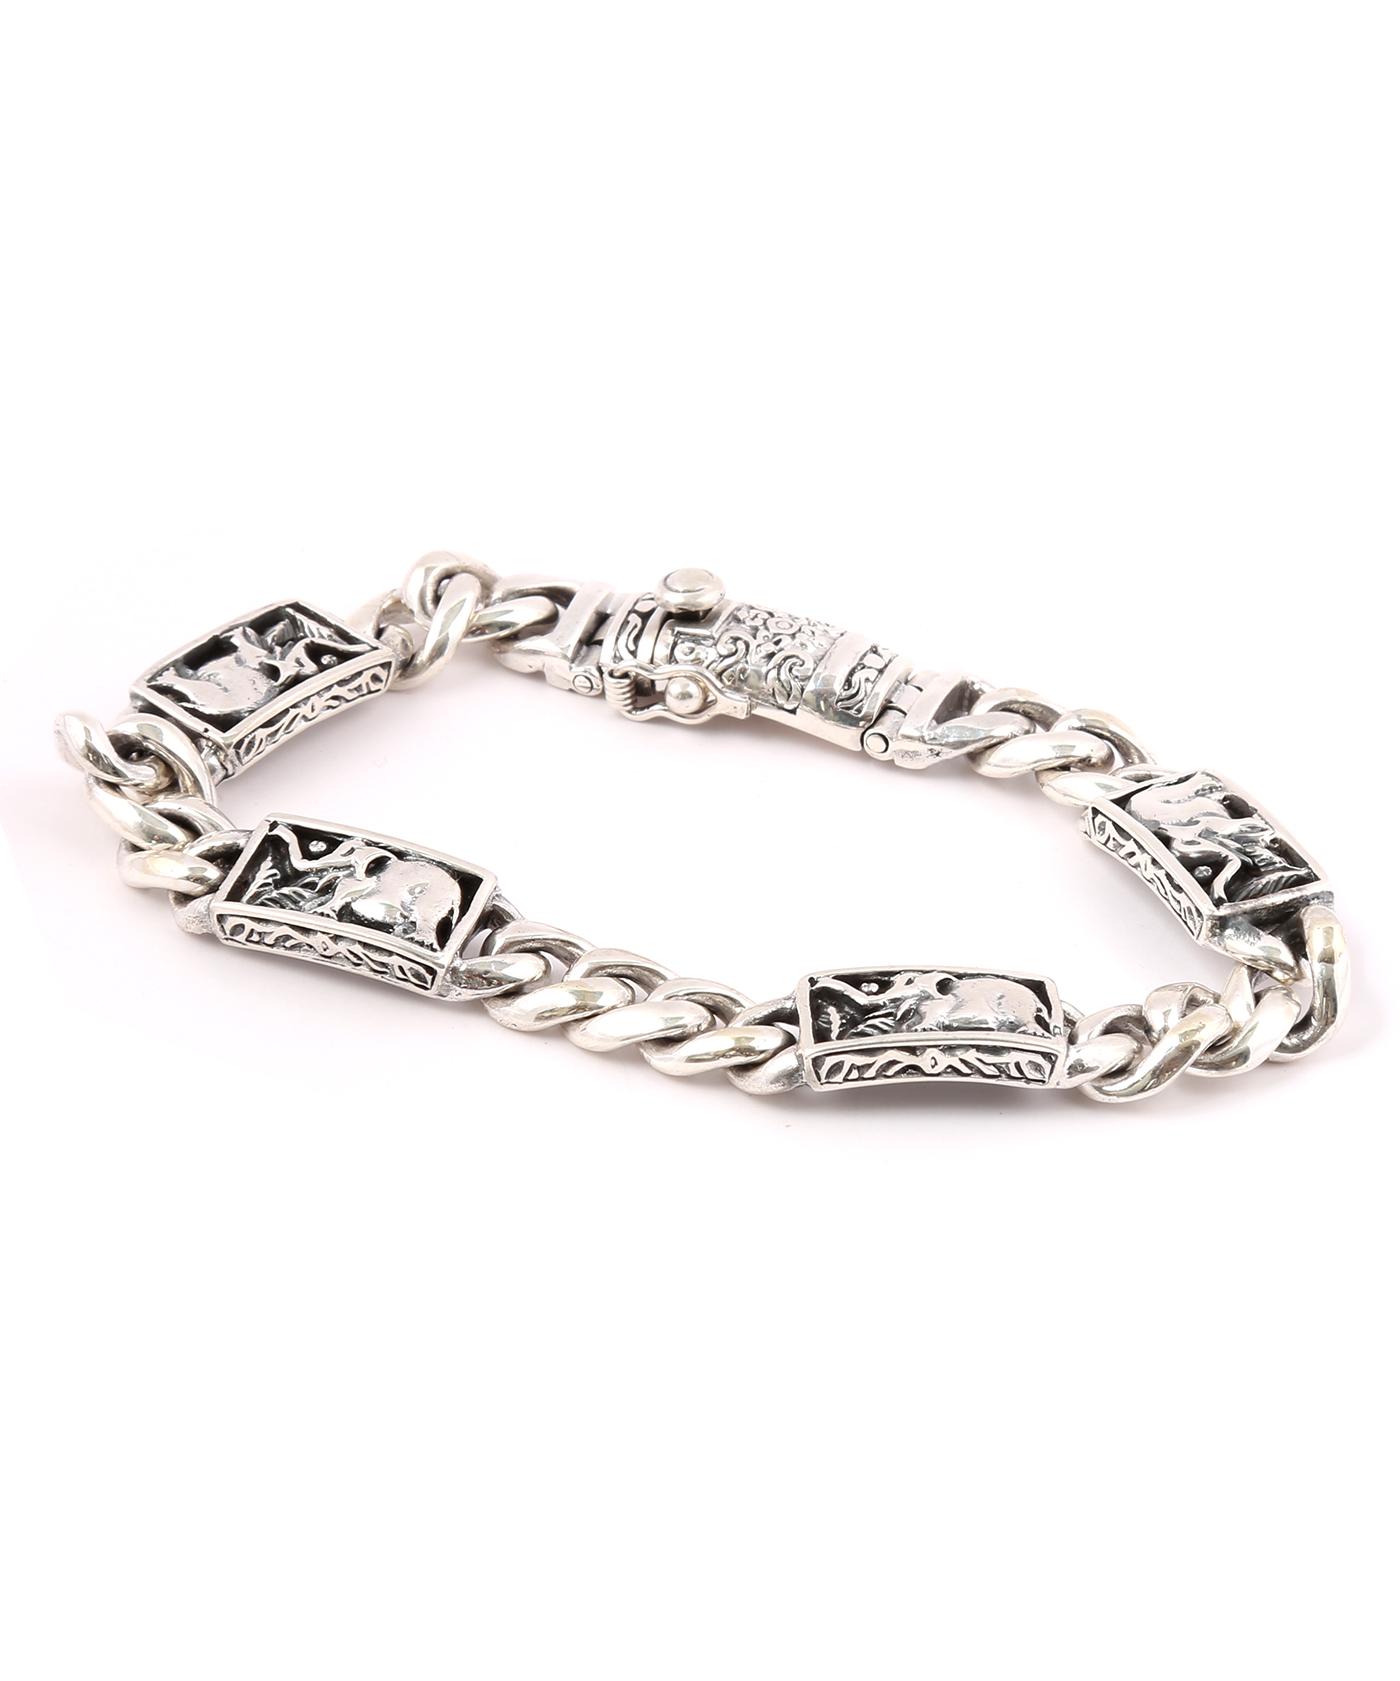 92 5 Sterling Silver Elephant Design Bracelet For Men Online Ping India